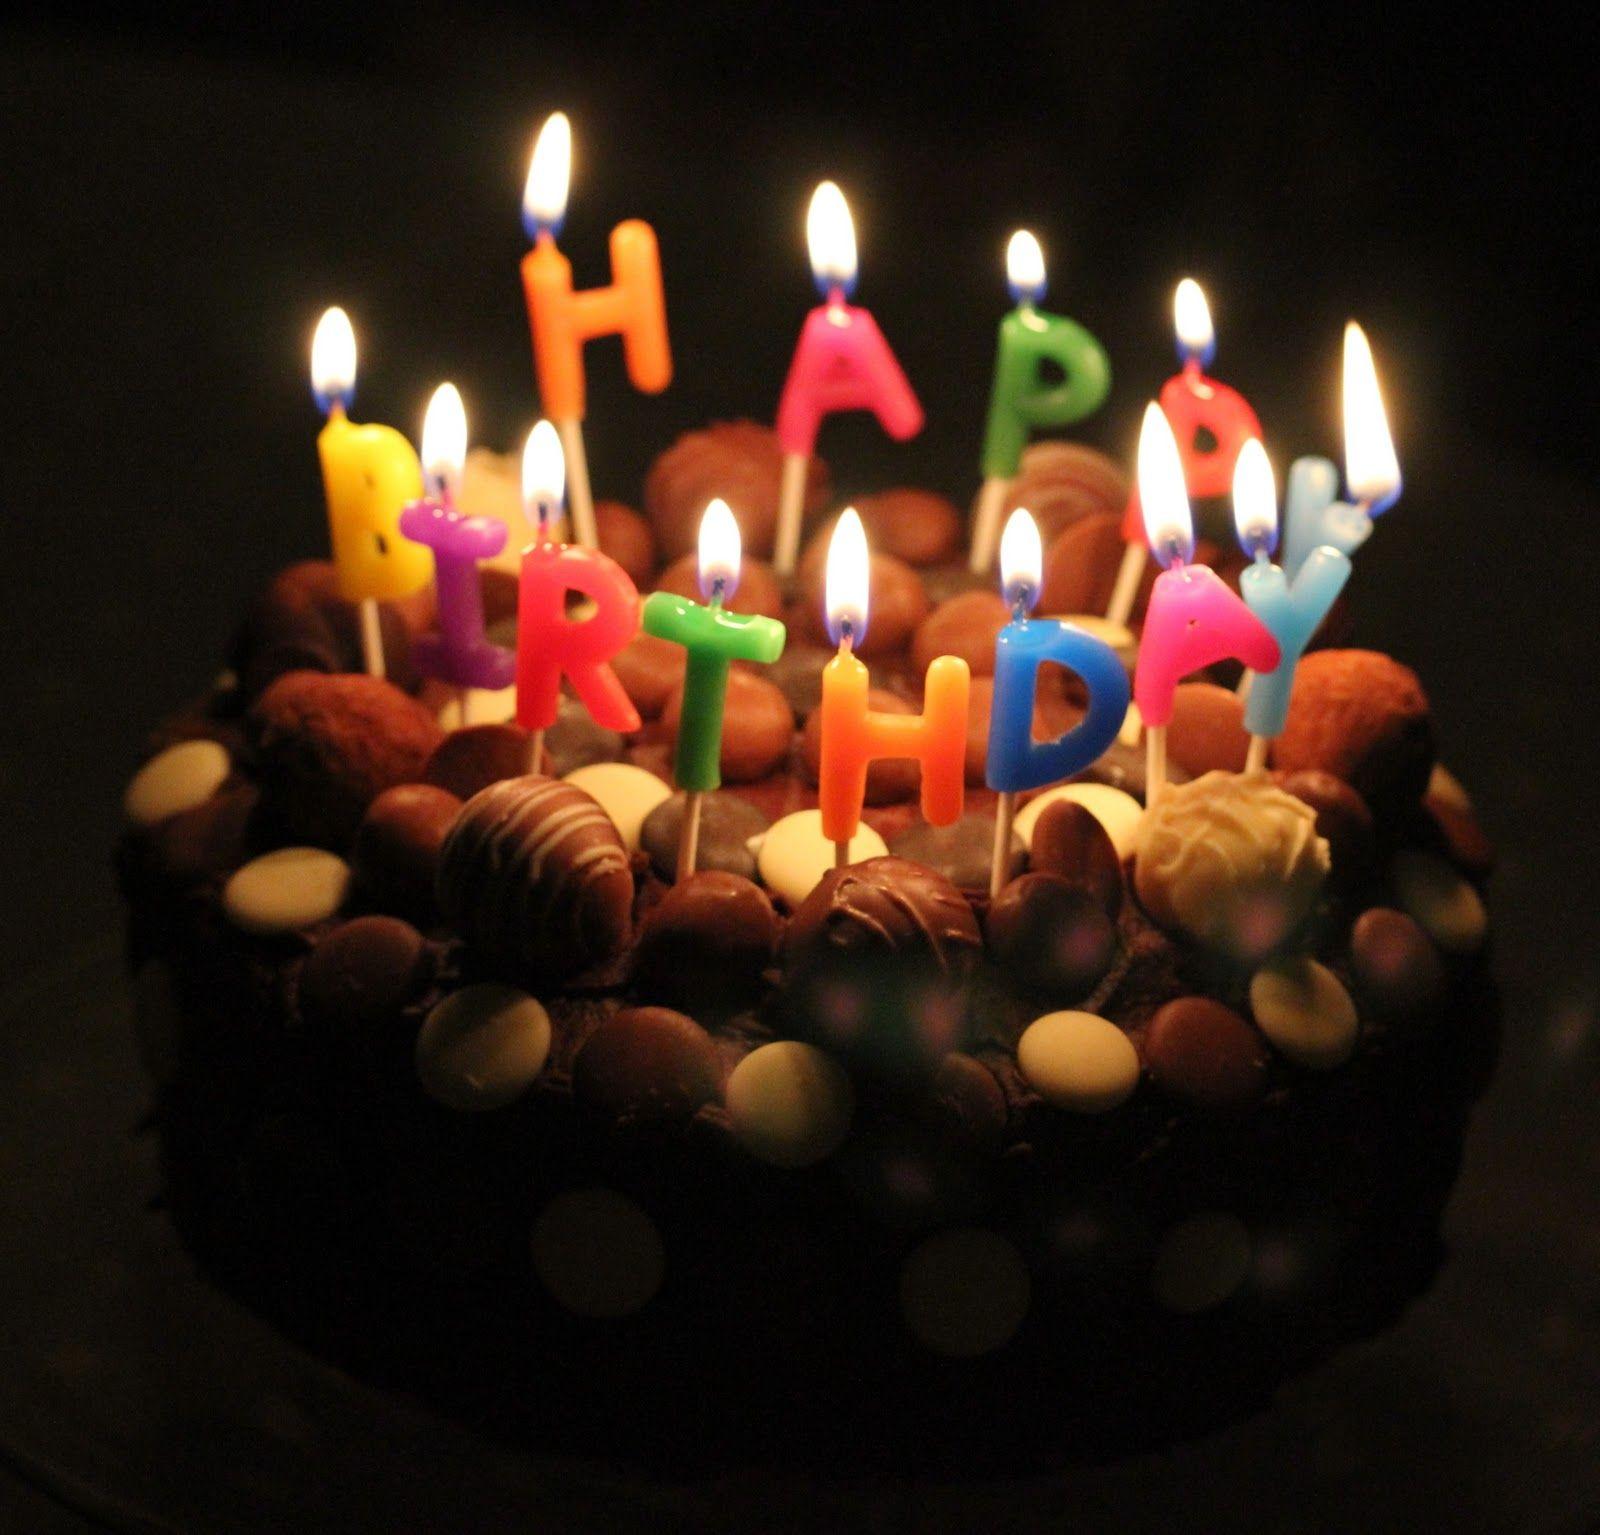 Happy birthday cake images Funny Happy Birthday wishes